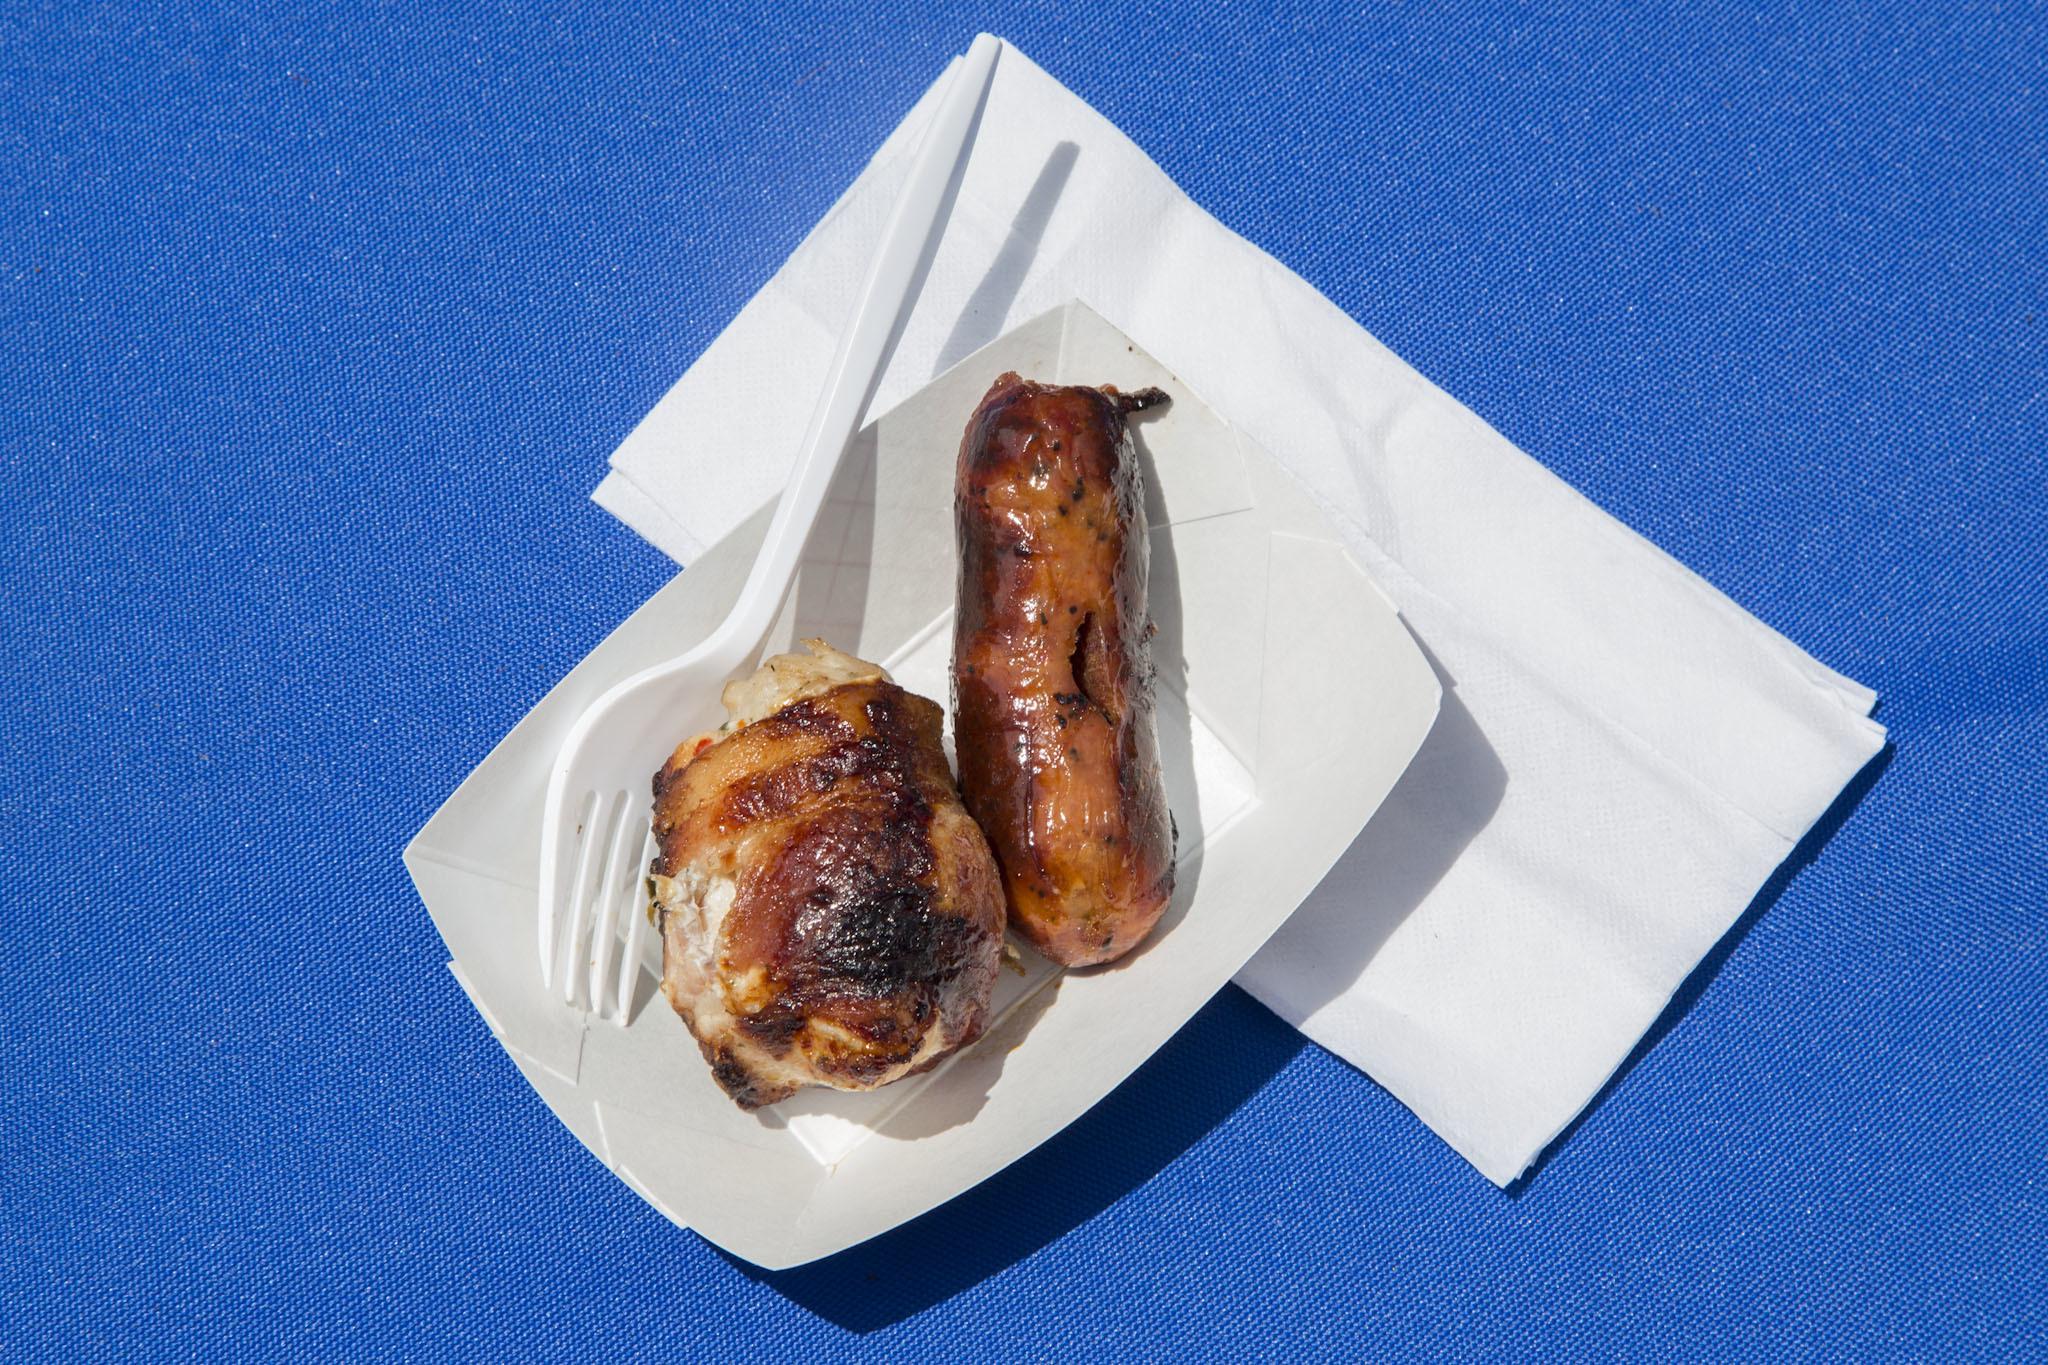 Chicken Wrapped in Bacon from Texas de Brazil